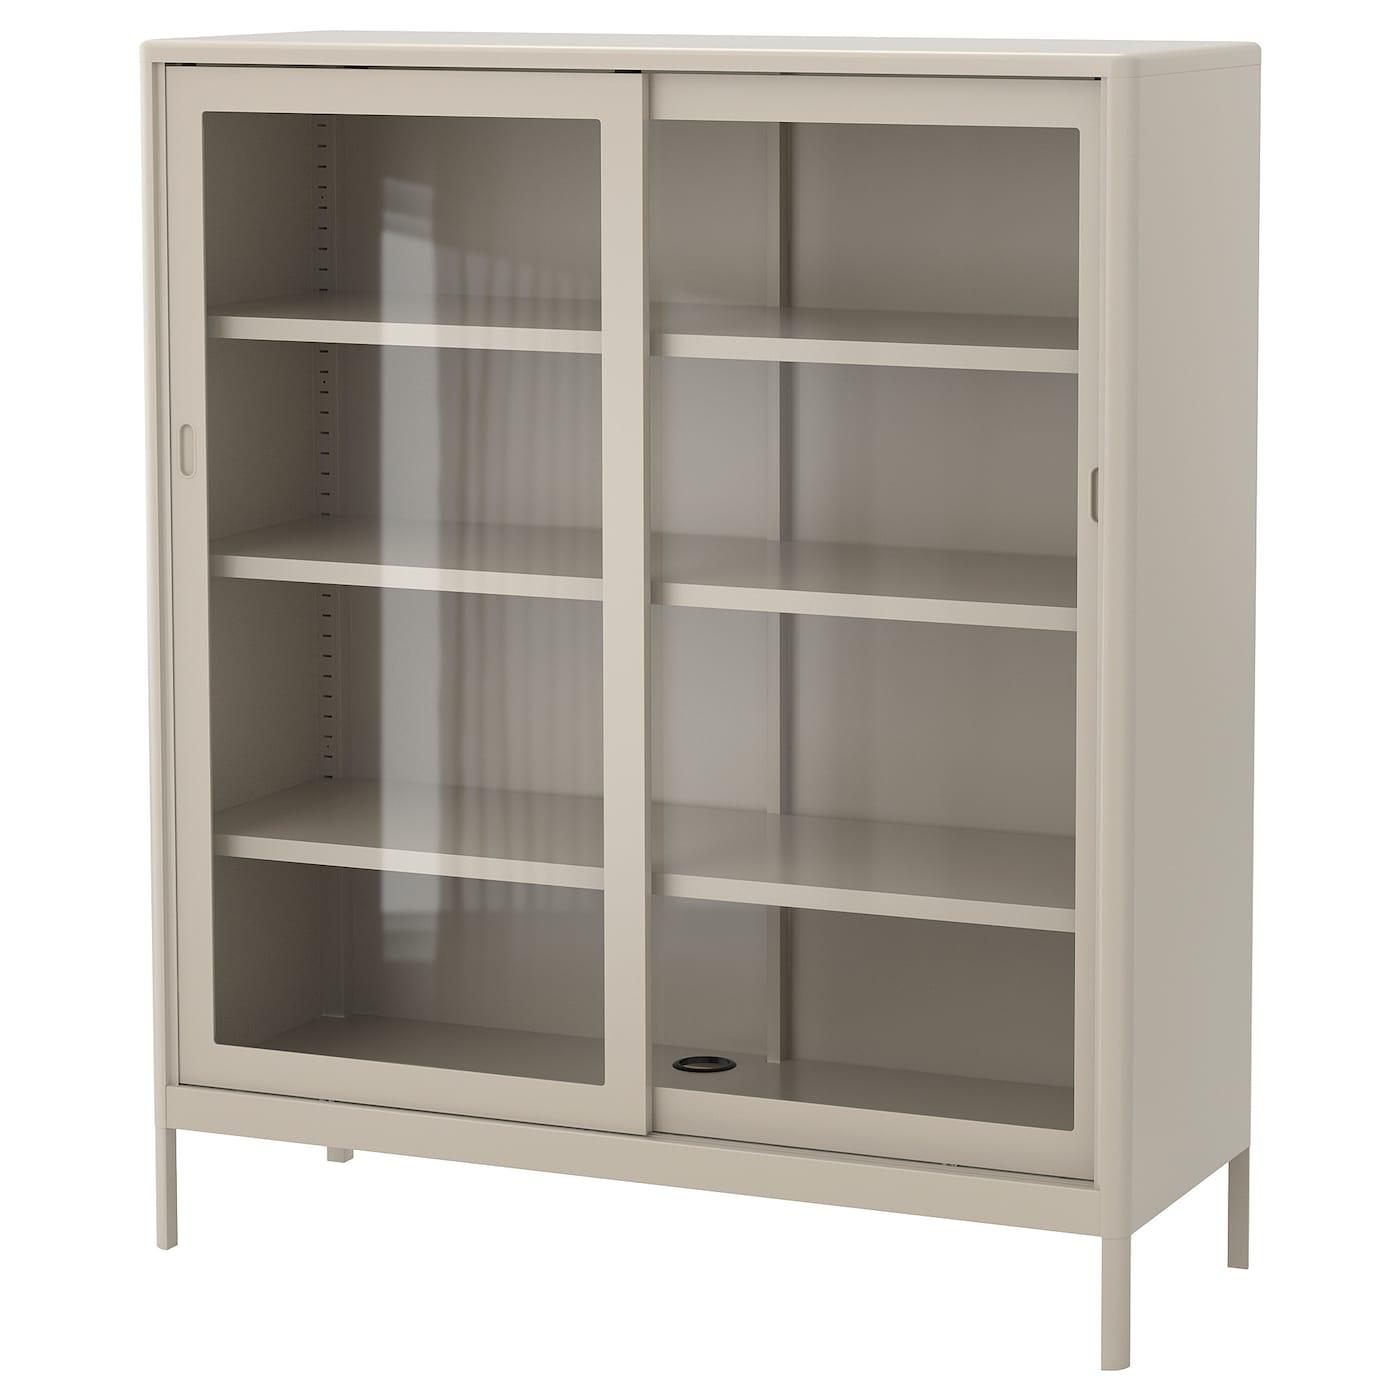 n-cabinet-with-sliding-glass-doors-beige__0613638_PE686433_S5